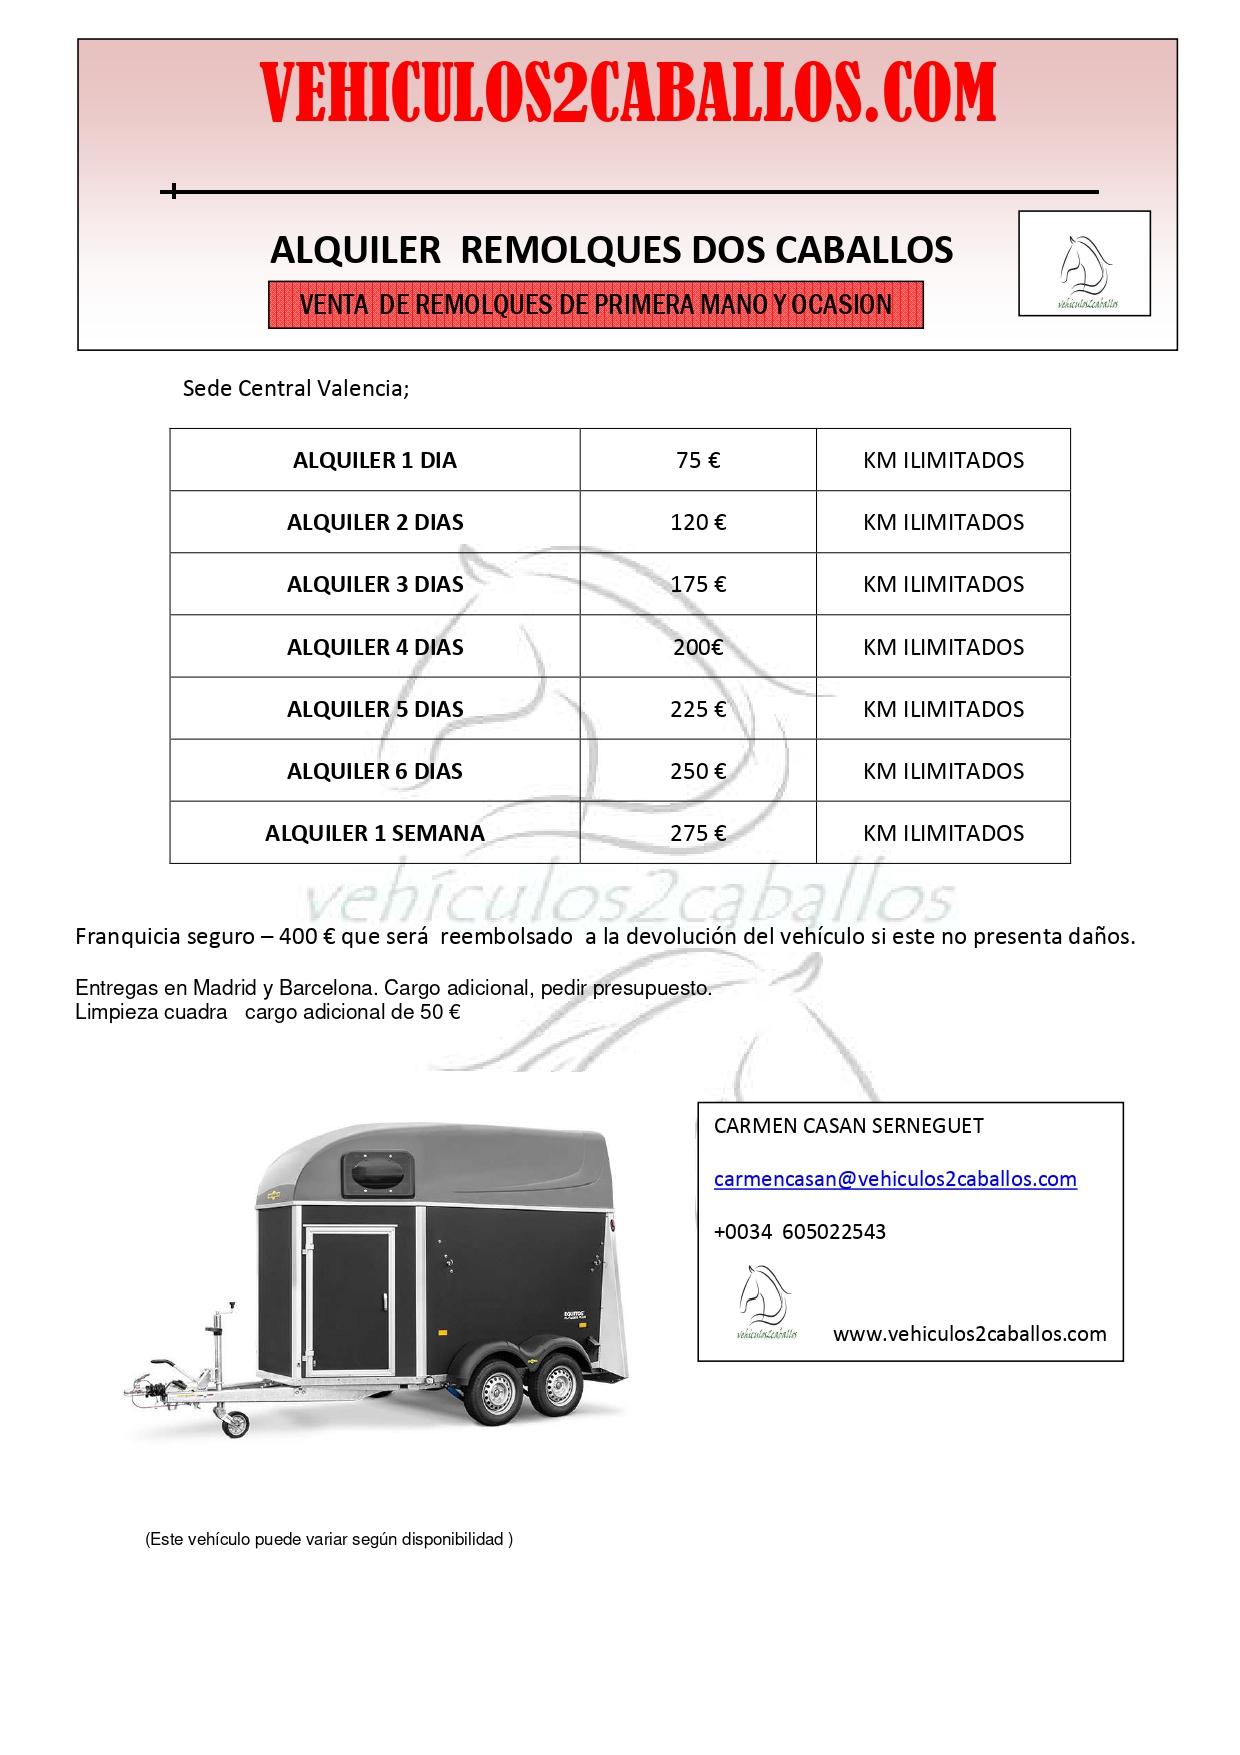 Alquiler Remolque 2020_page-0001